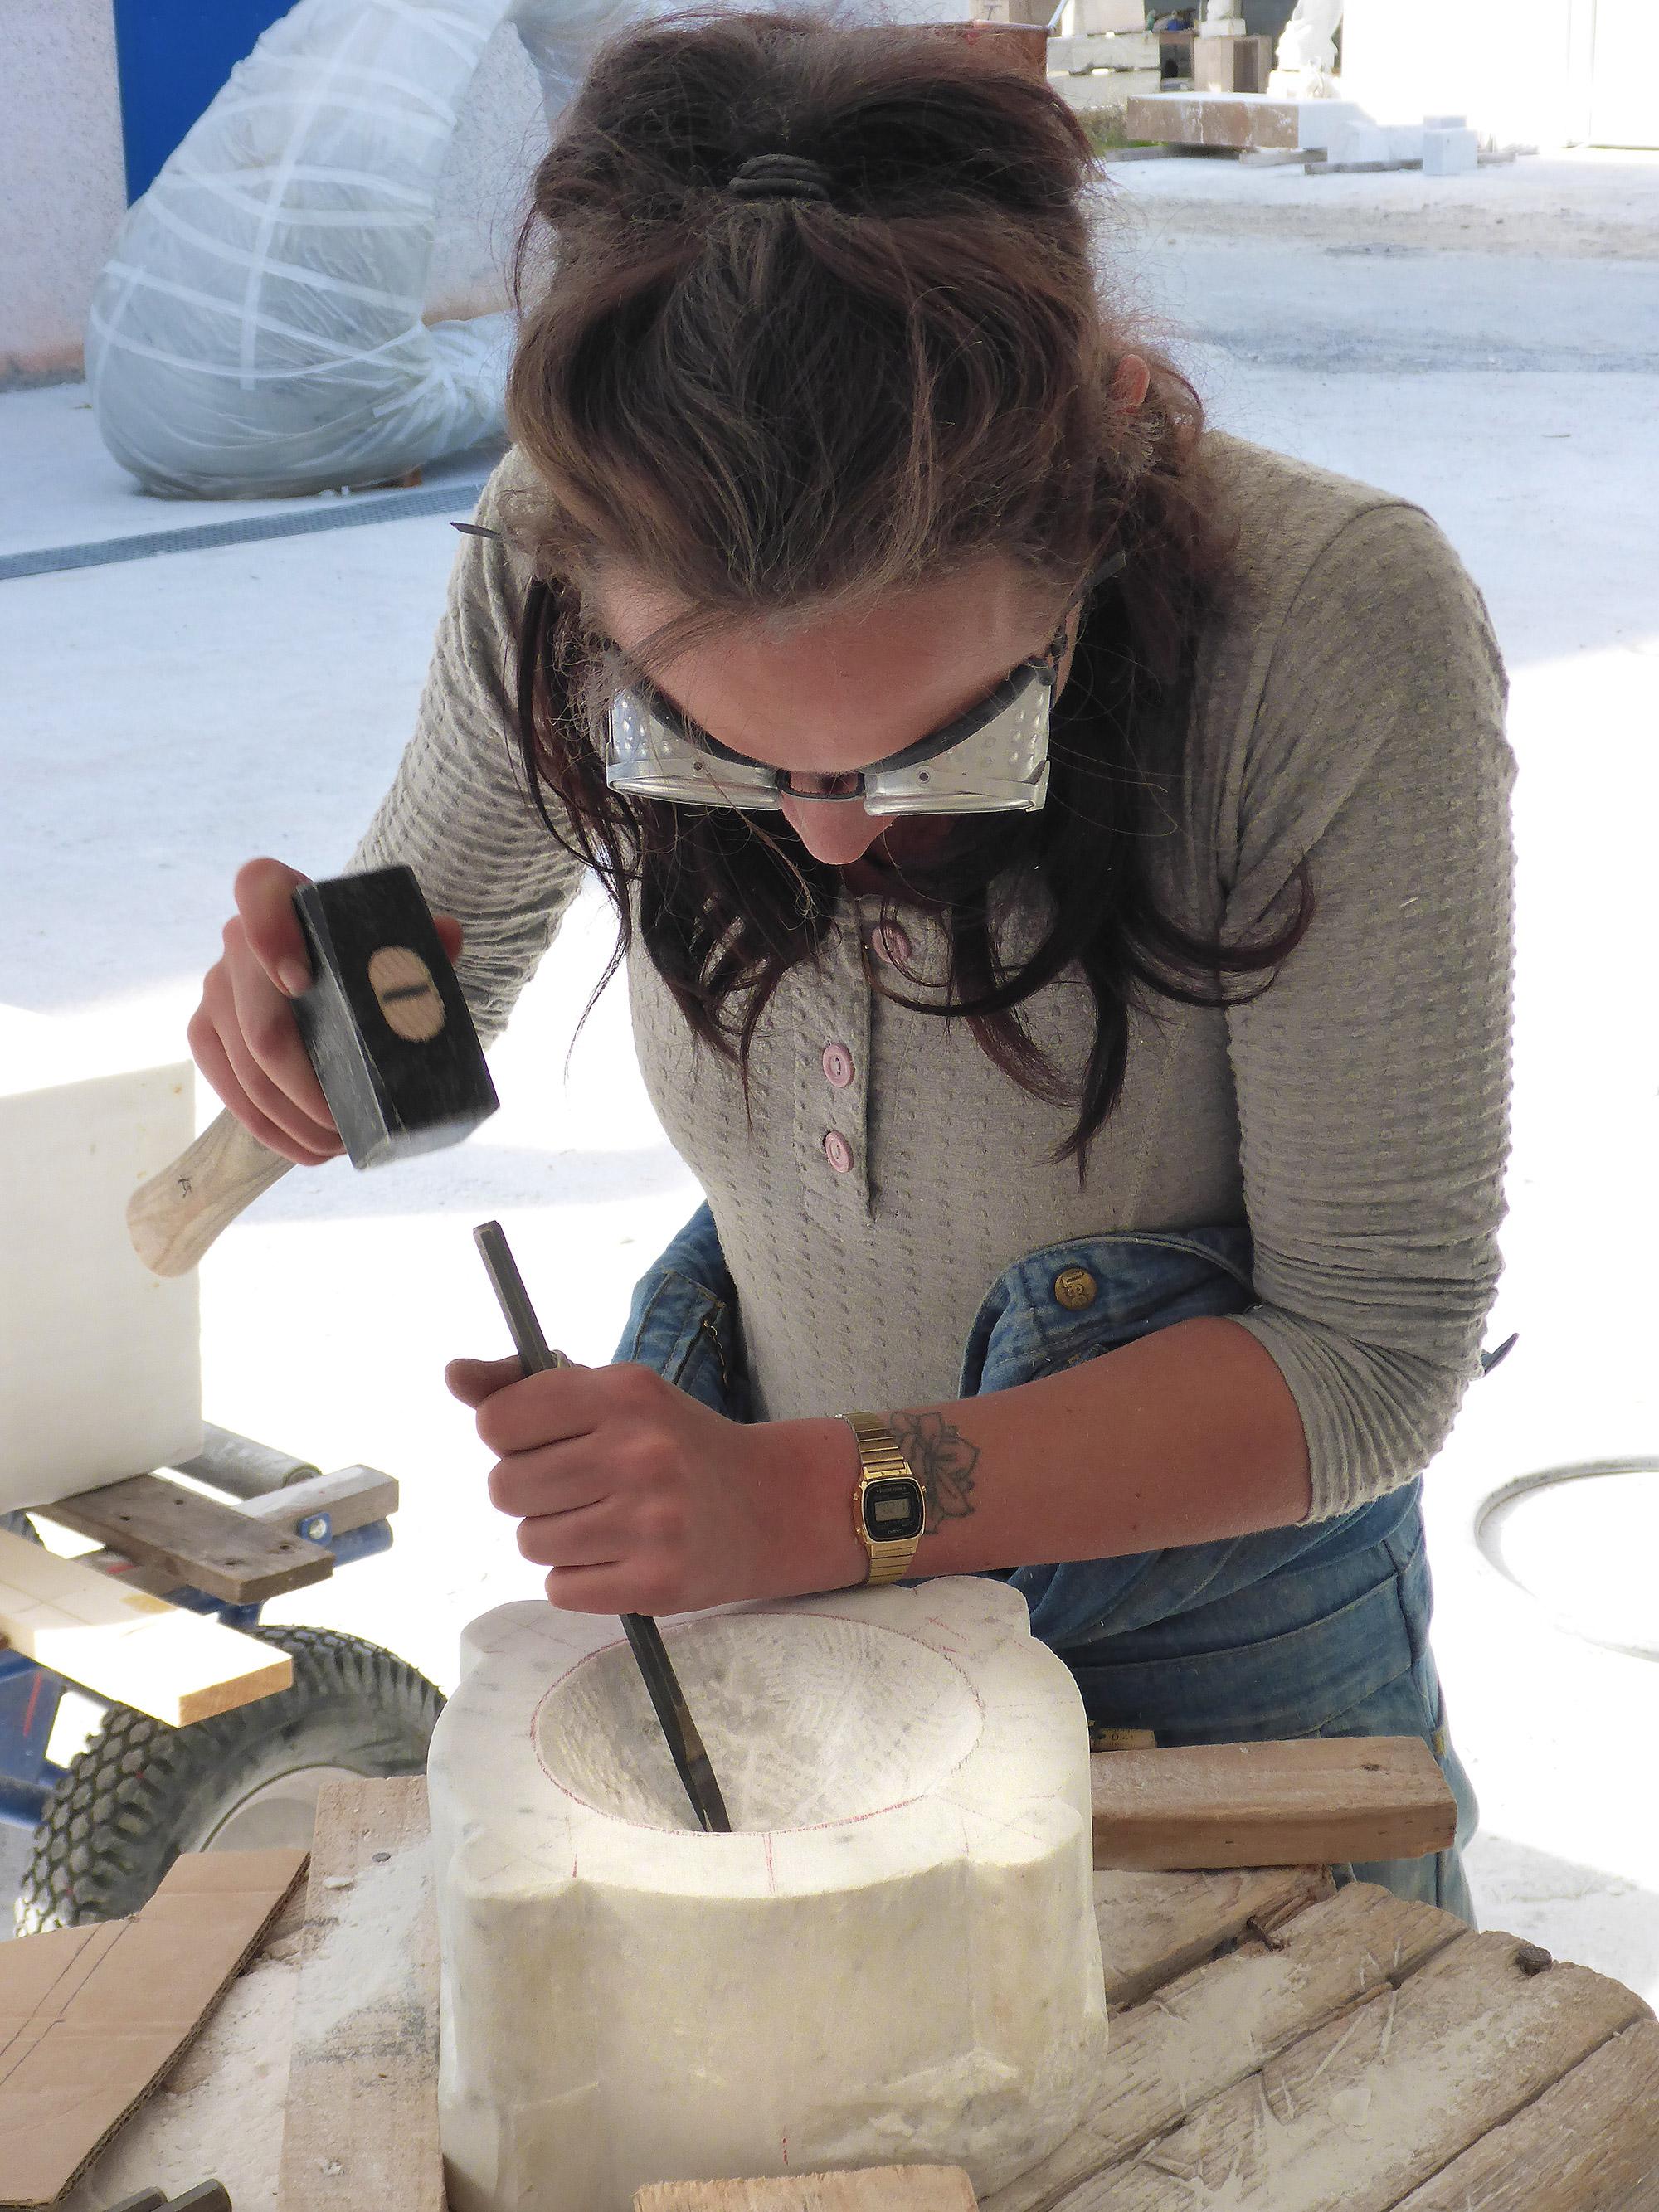 Amelia-Kate-Sampson-Carving-Marble.jpg